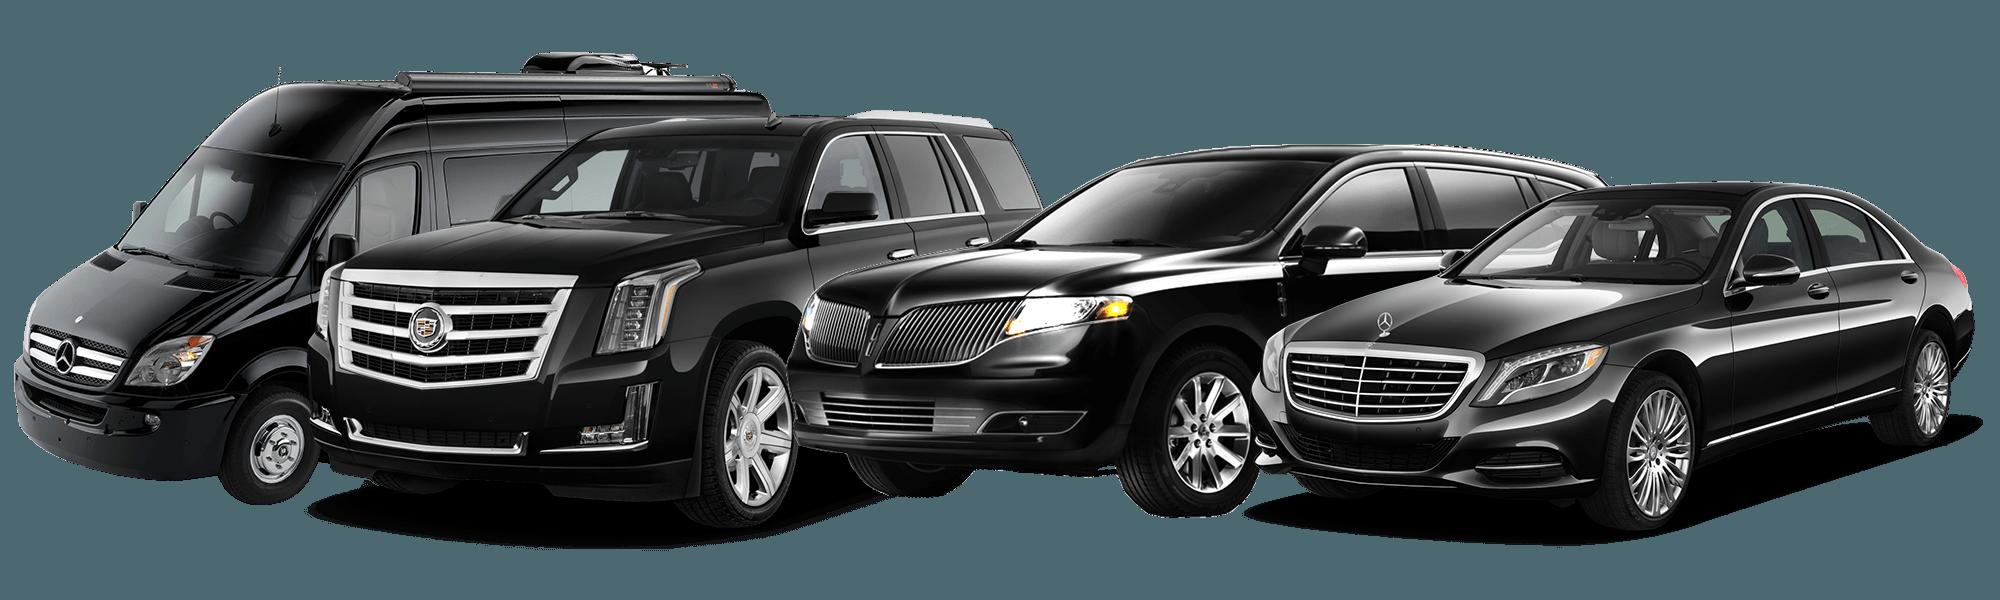 Sedan Car Services